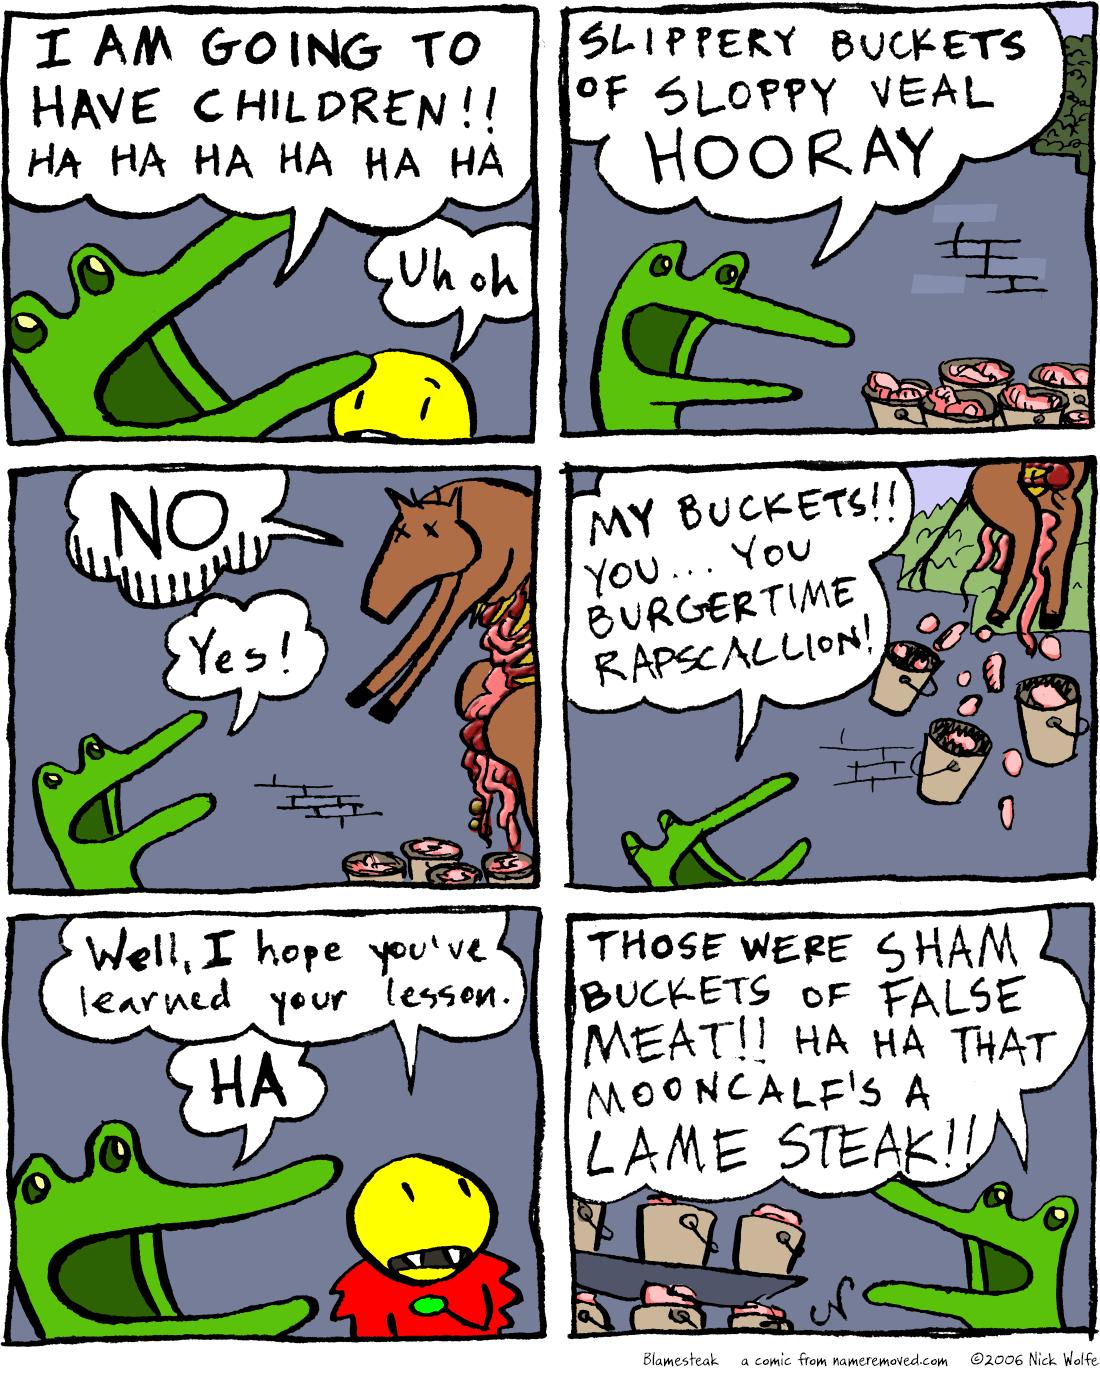 Blamesteak